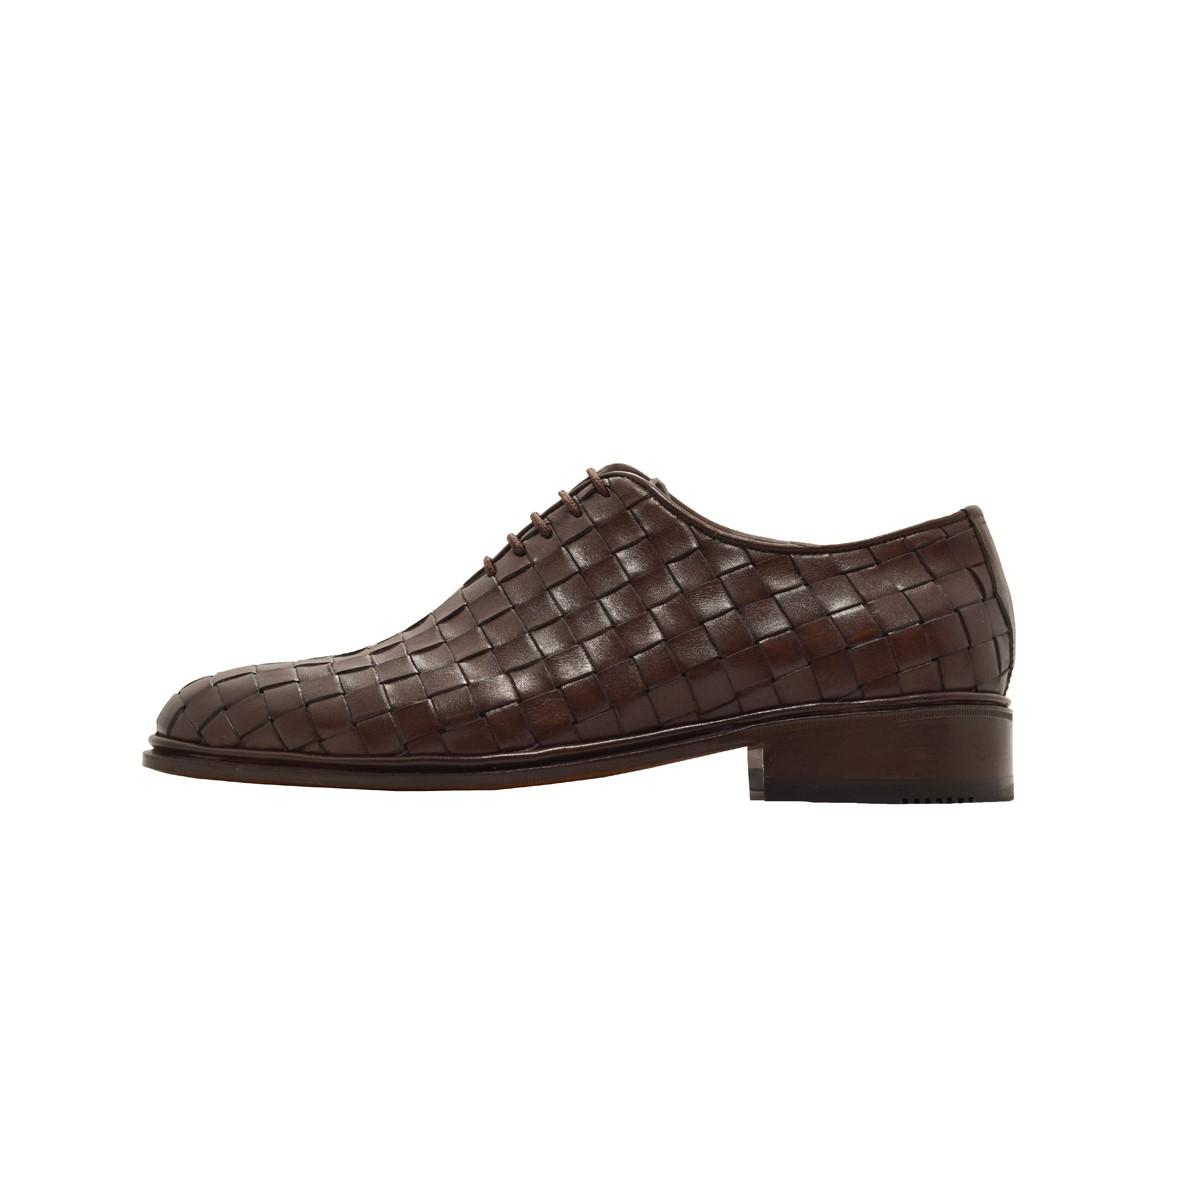 کفش مردانه دگرمان مدل بوریا کد deg.2br2102 -  - 2